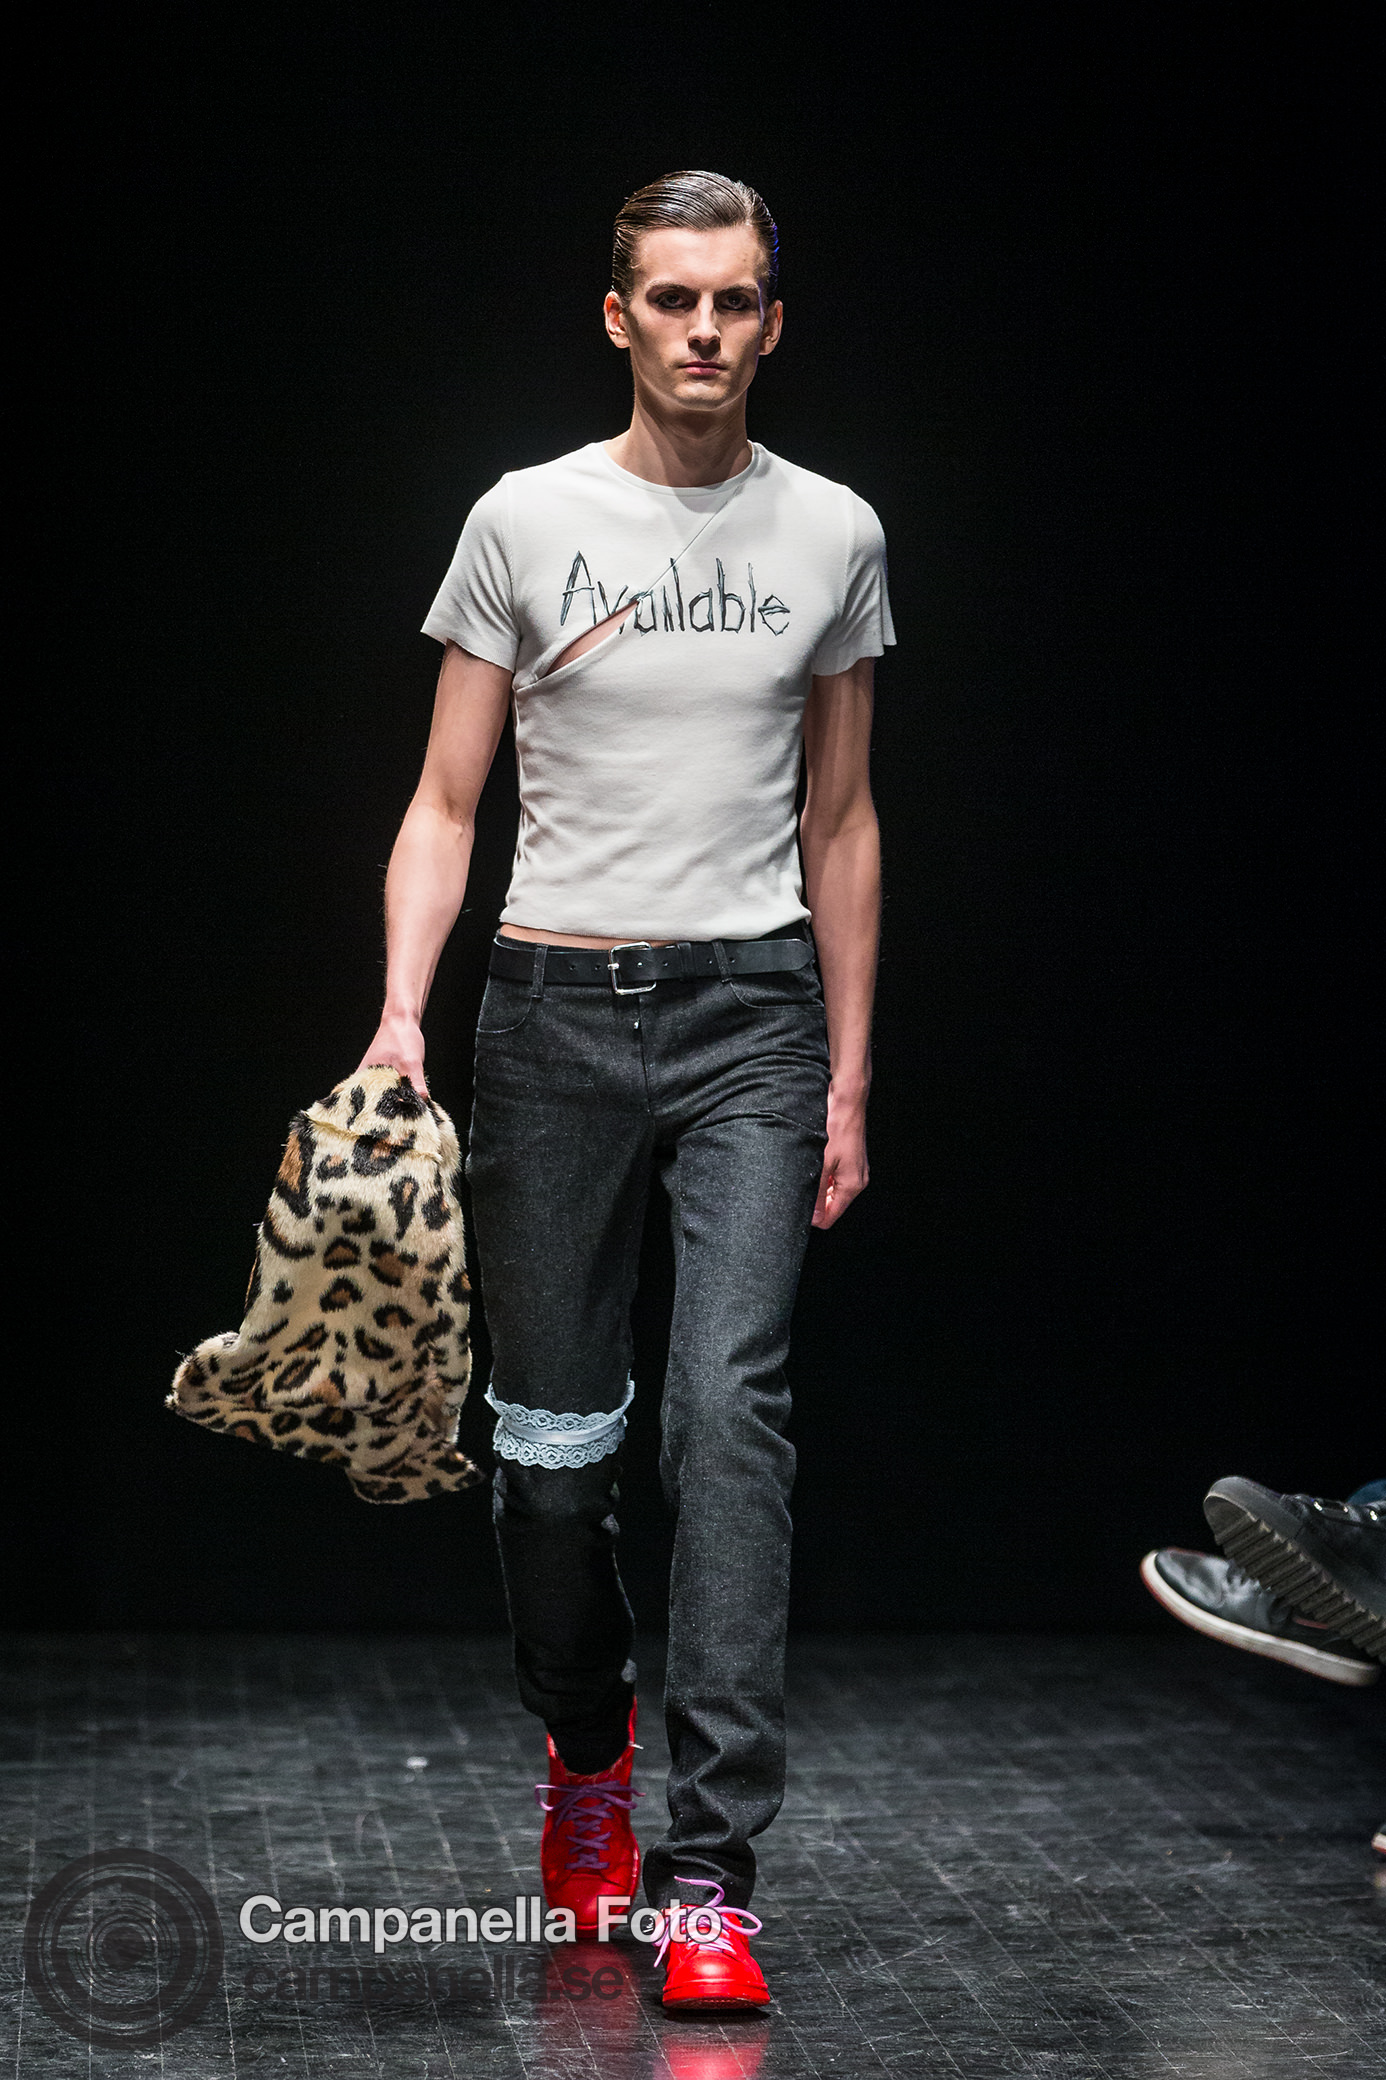 Fashion Week Stockholm A/W 2017 - Michael Campanella Photography